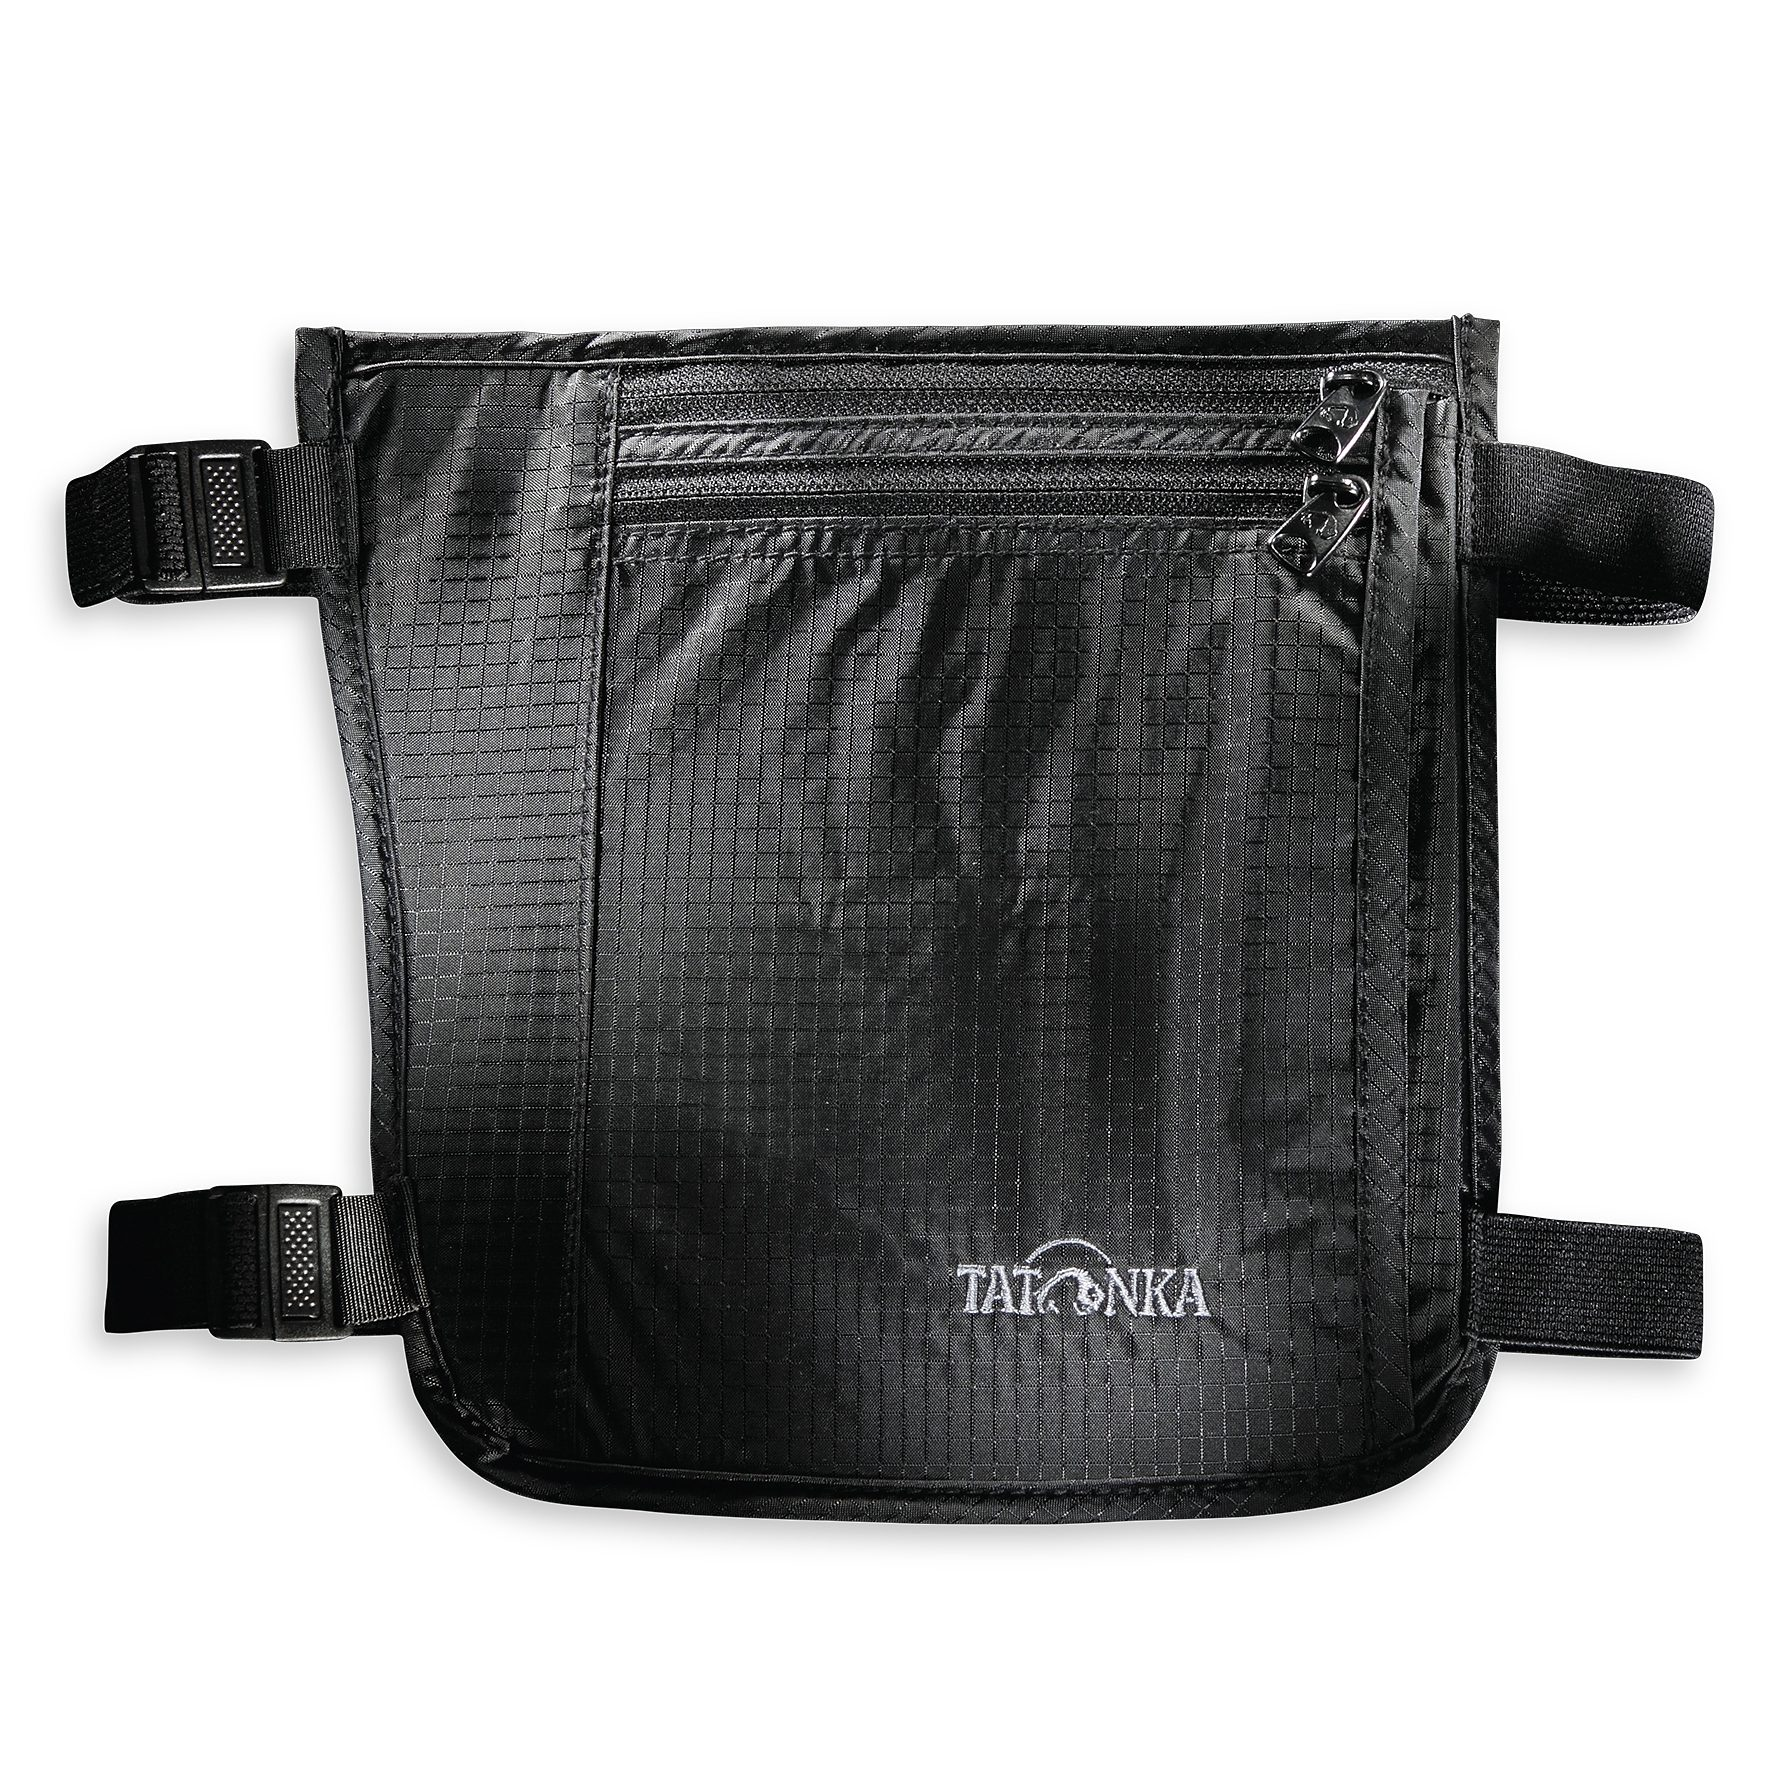 Tatonka Wertsachenaufbewahrung »Skin Secret Pocket«